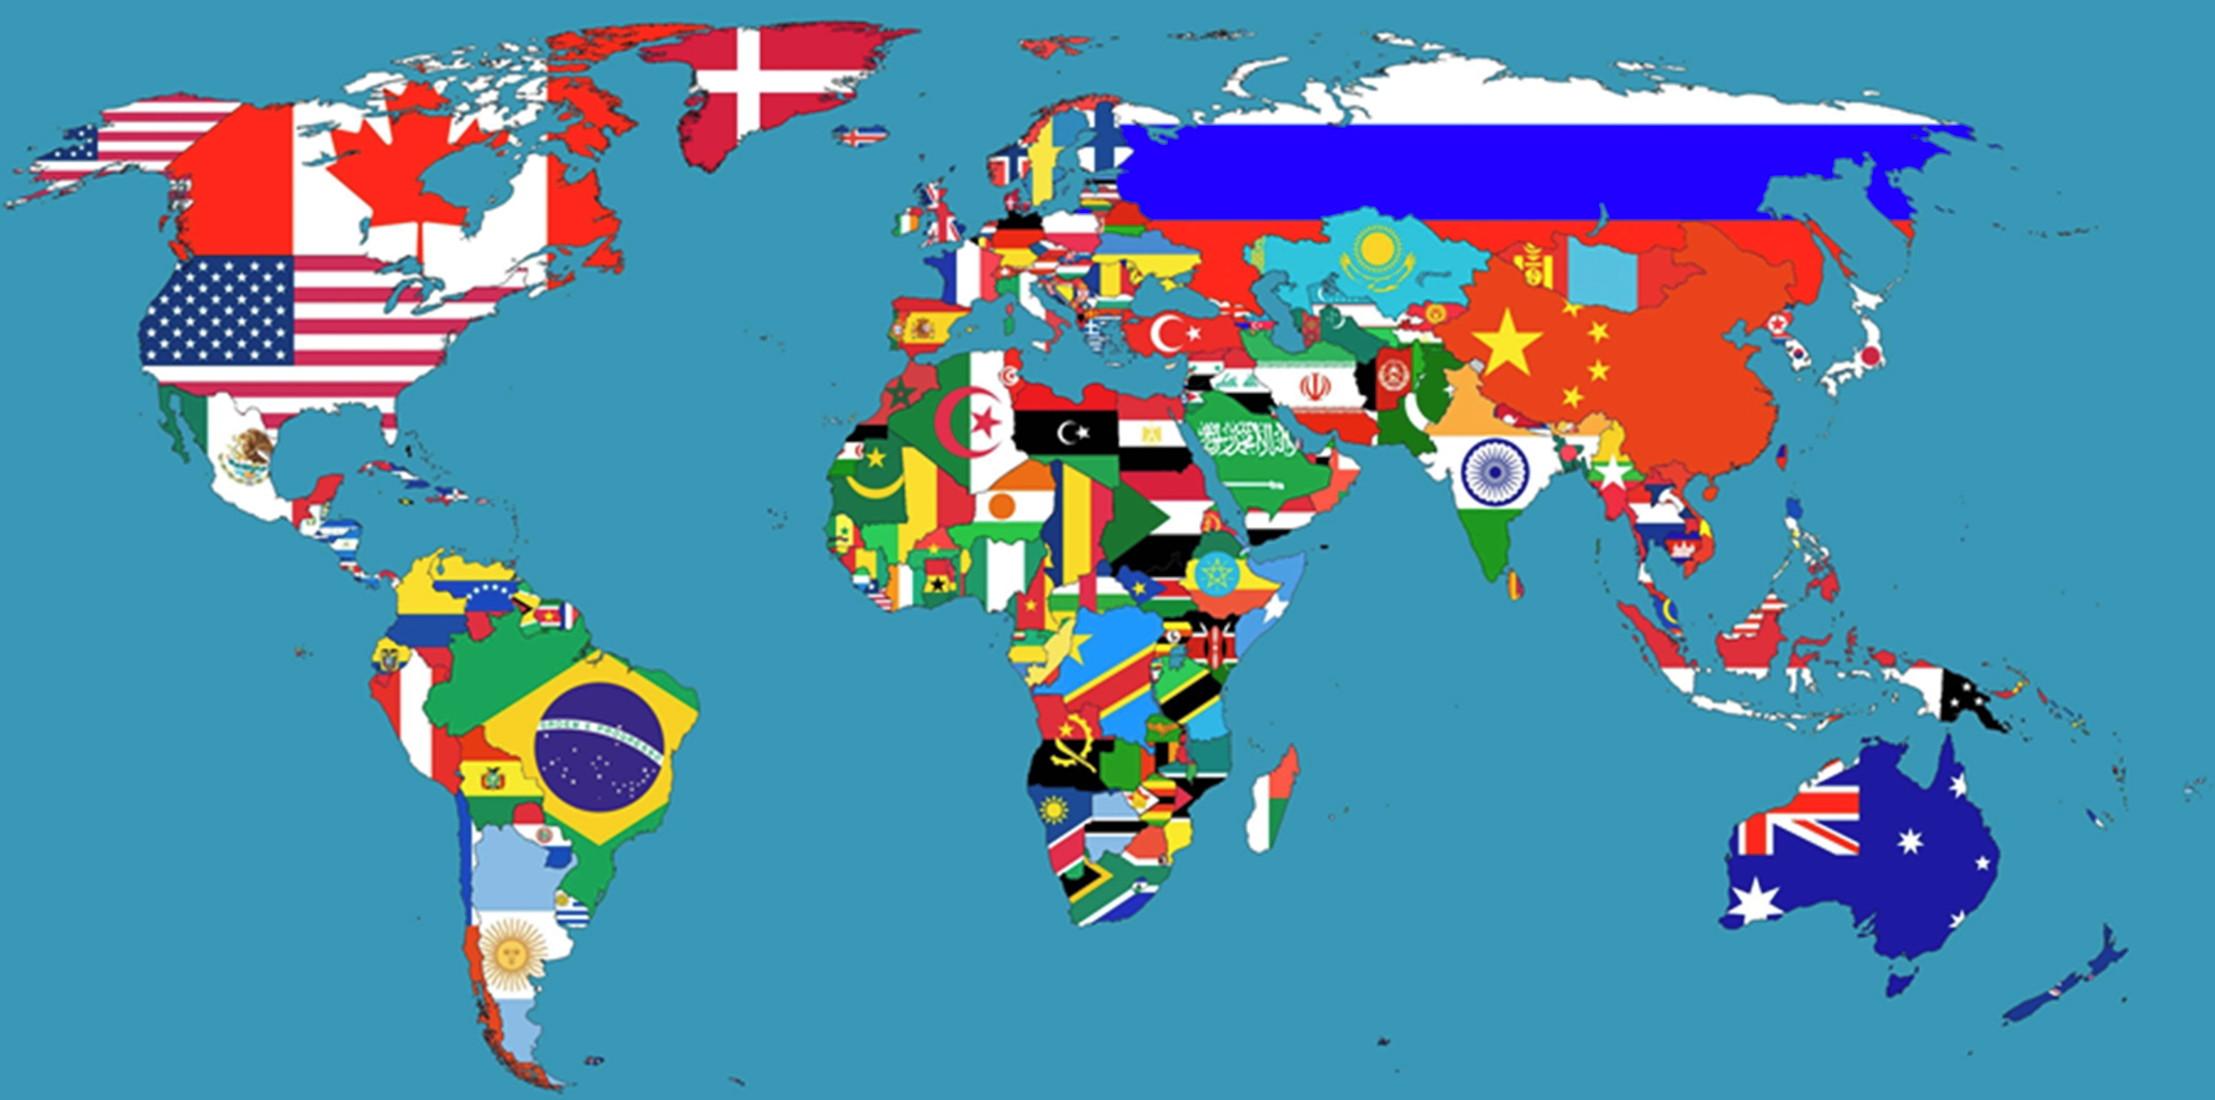 Quadro -Pôster Mapa Múndi Bandeiras*** no Elo7 | ENCANTOS PARA CASA (E5536A)